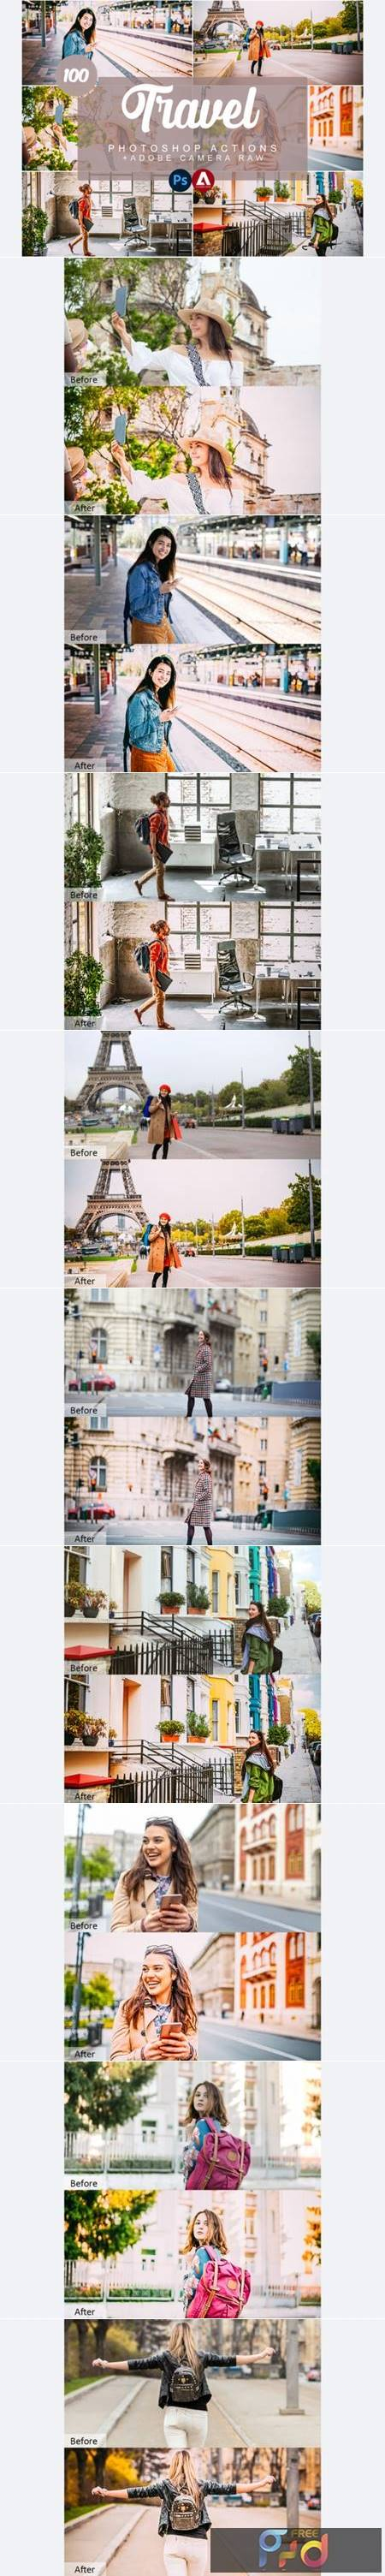 Travel Photoshop Actions 7506060 1